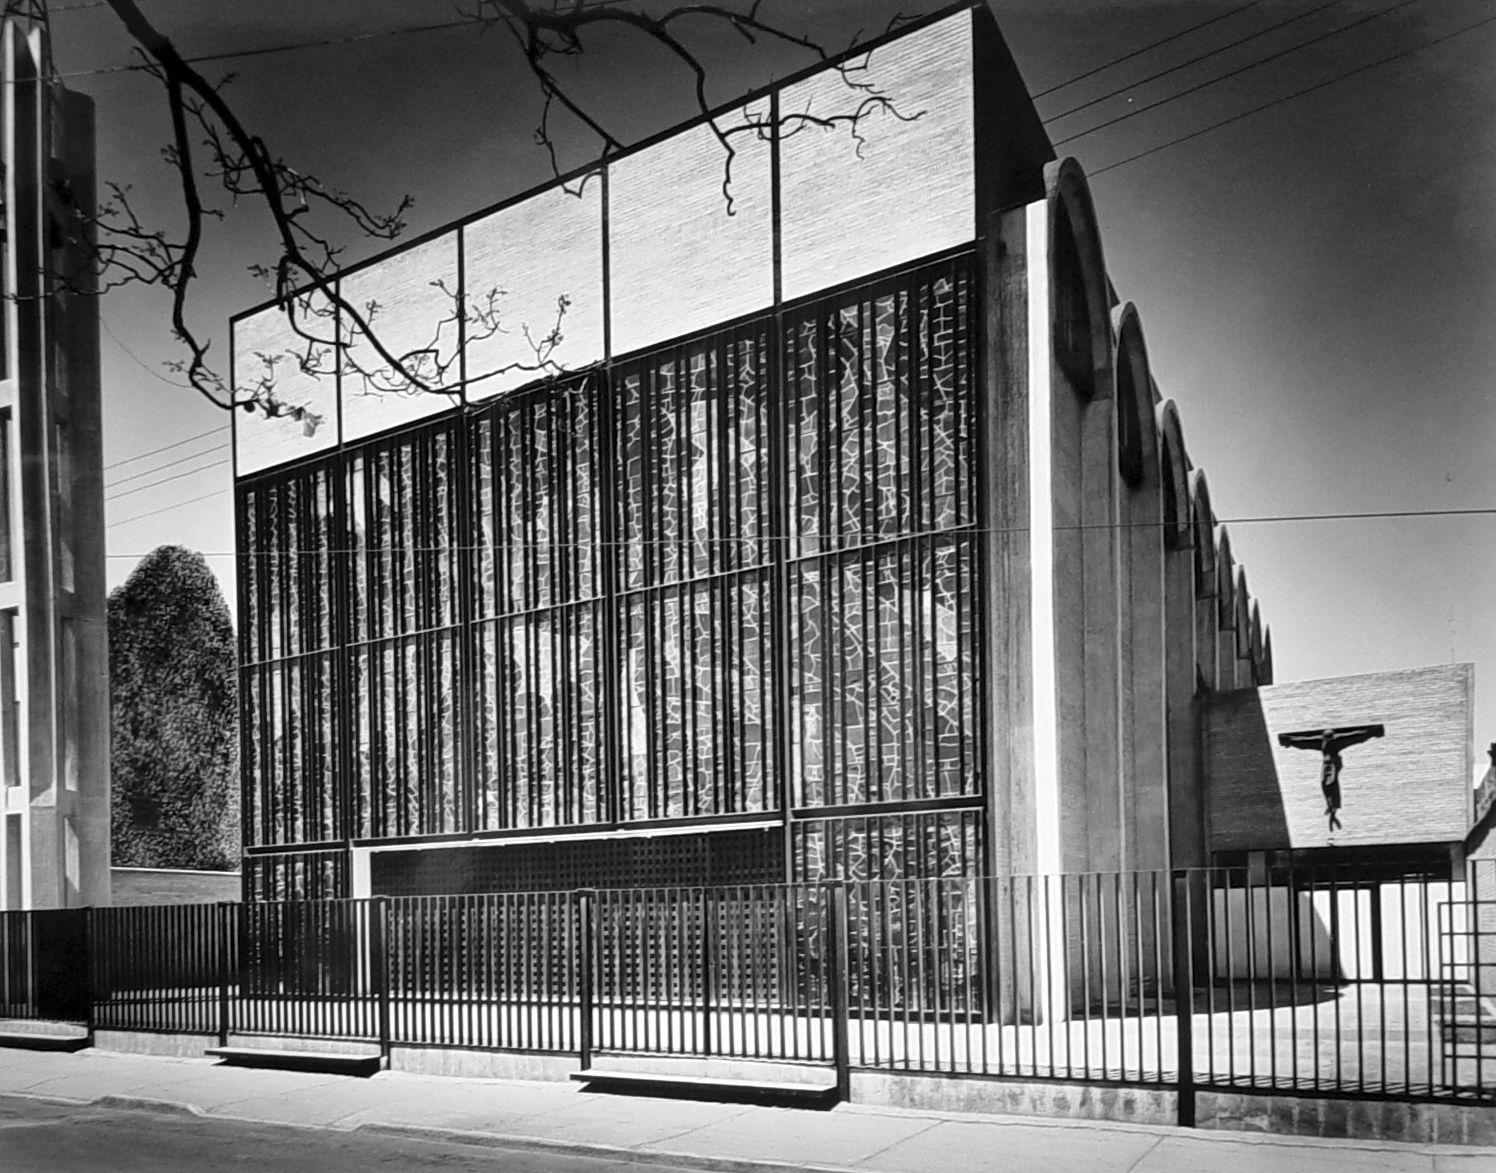 Iglesia de la sagrada familia 1960 m xico d f enrique for Arquitectura mexicana moderna